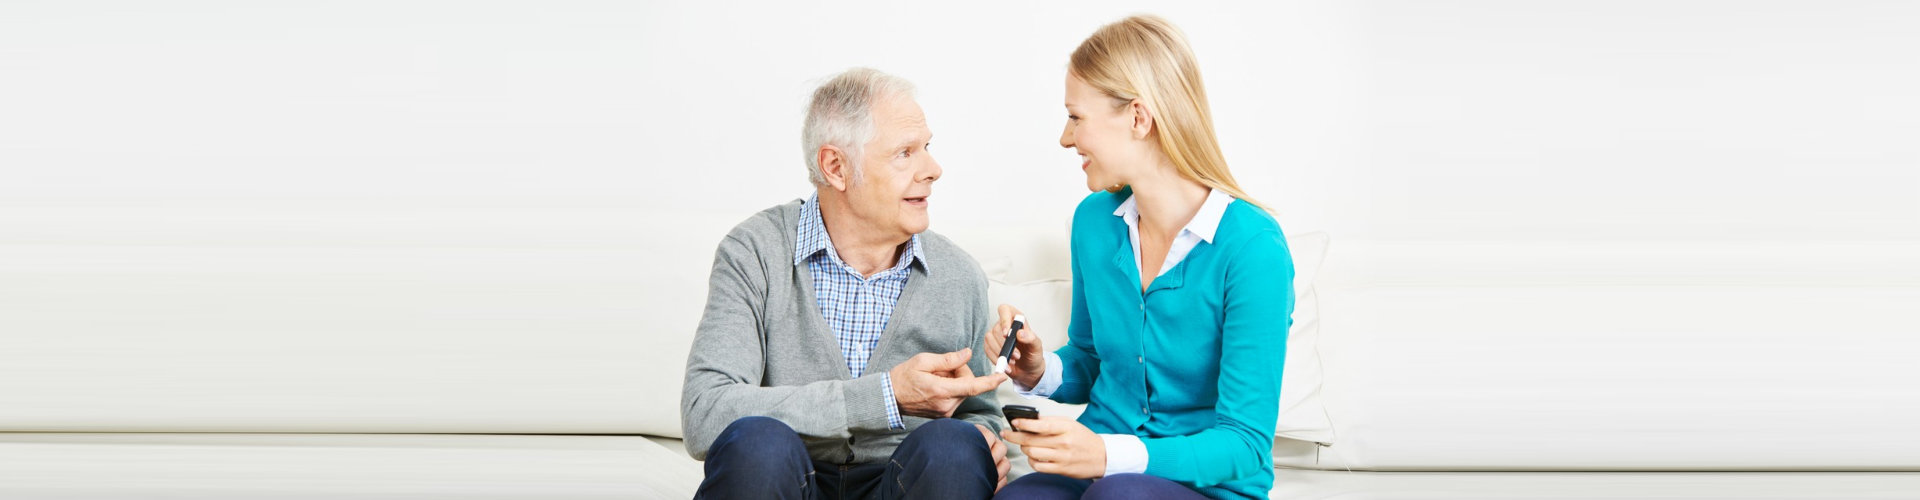 nurse taking elder man's blood sugar level using a glucometer